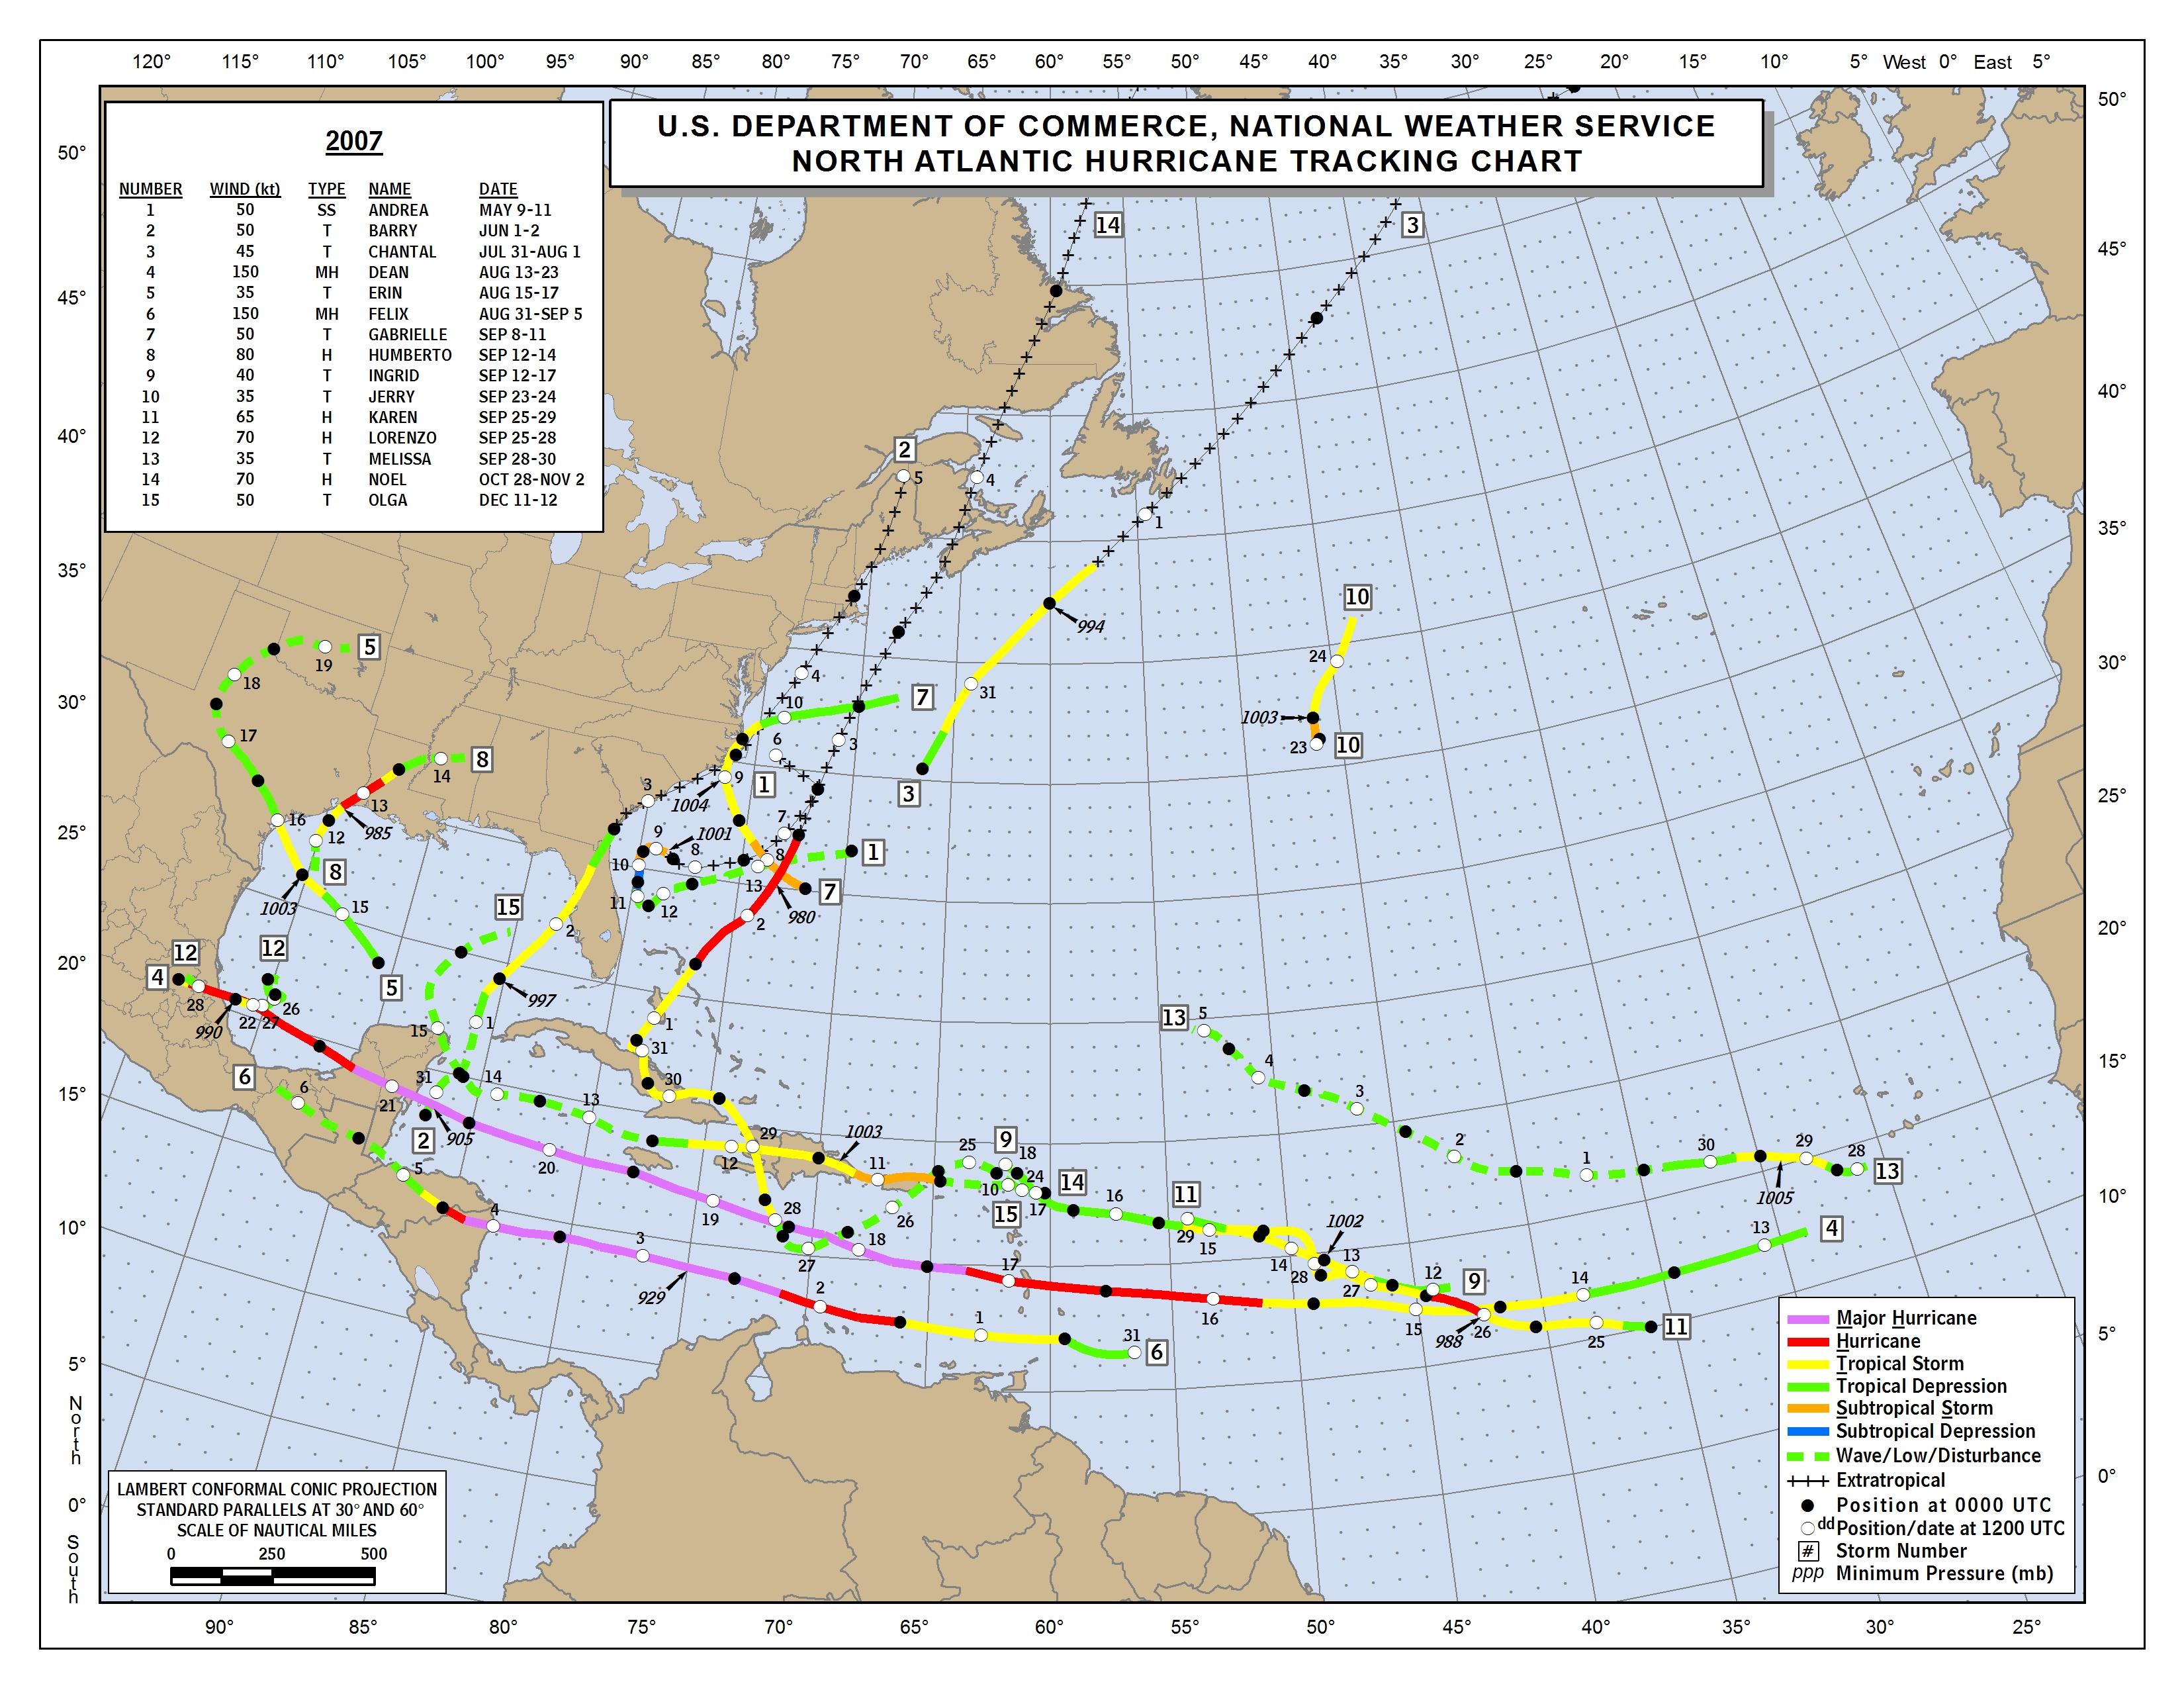 JHU/APL Atlantic Hurricane Track Maps & Images  |Atlantic Hurricane Tracking Map